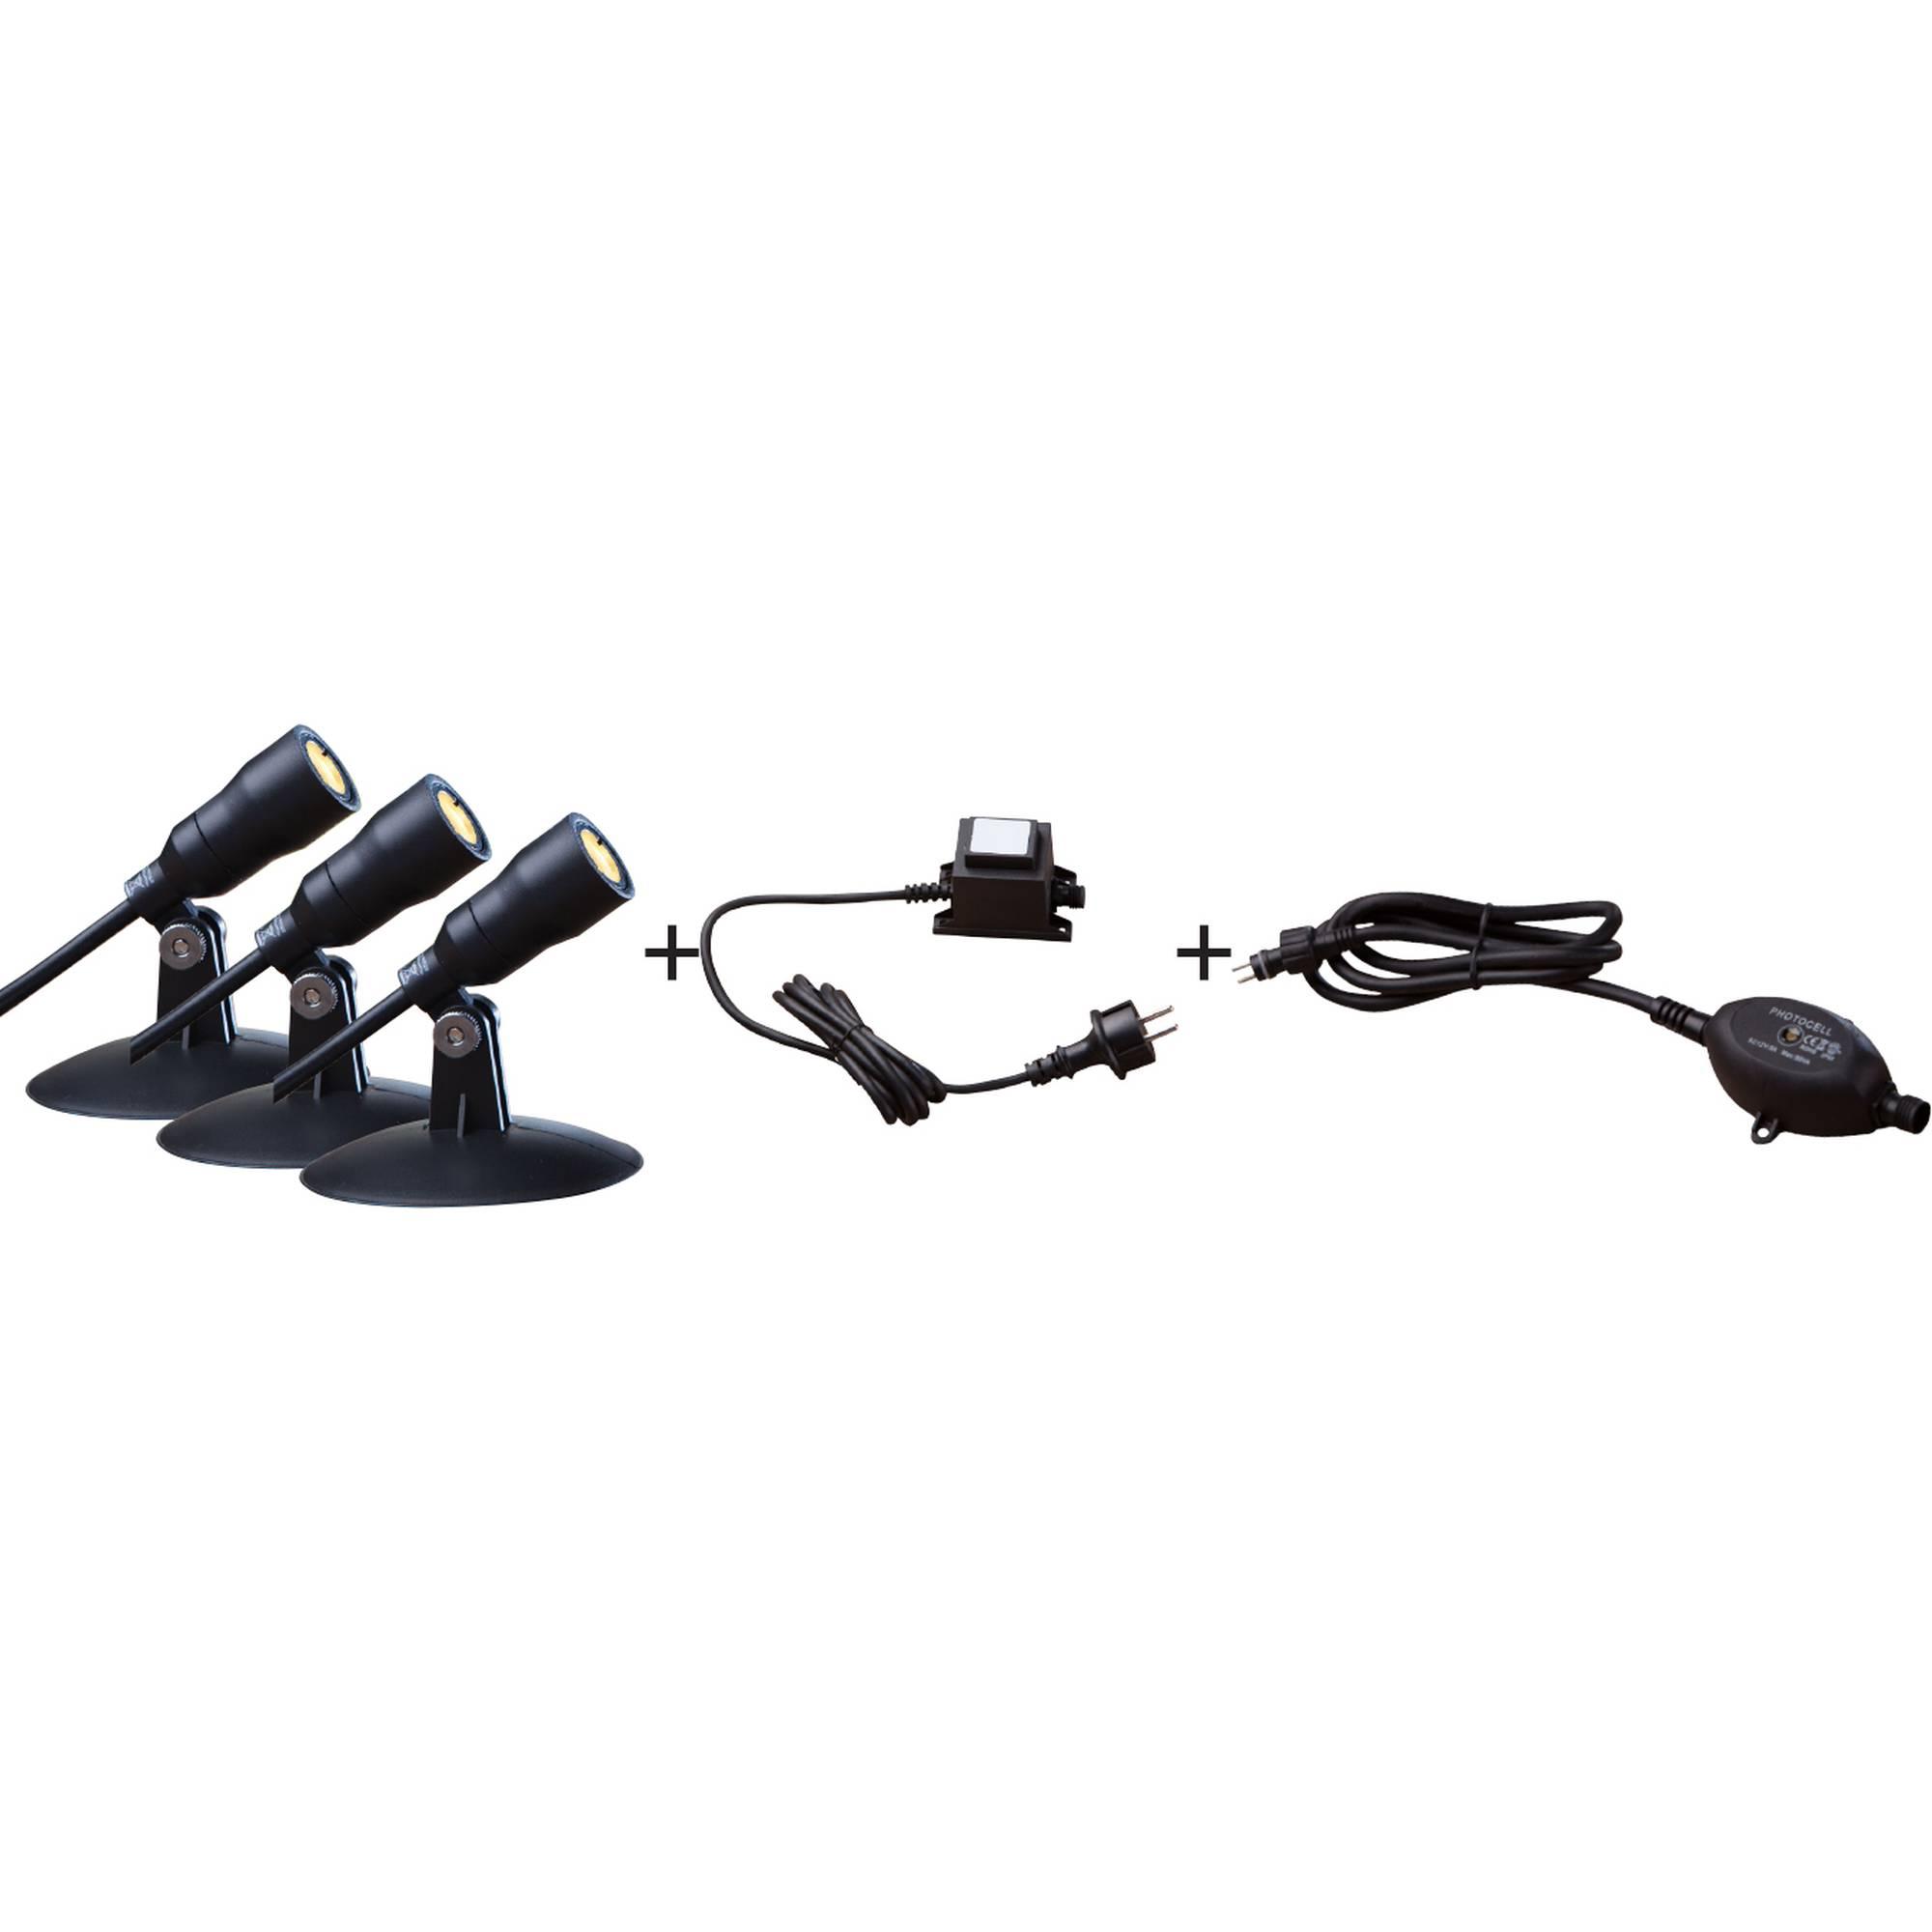 Heissner L410-00 Smart Light Starter Set LED-Spots